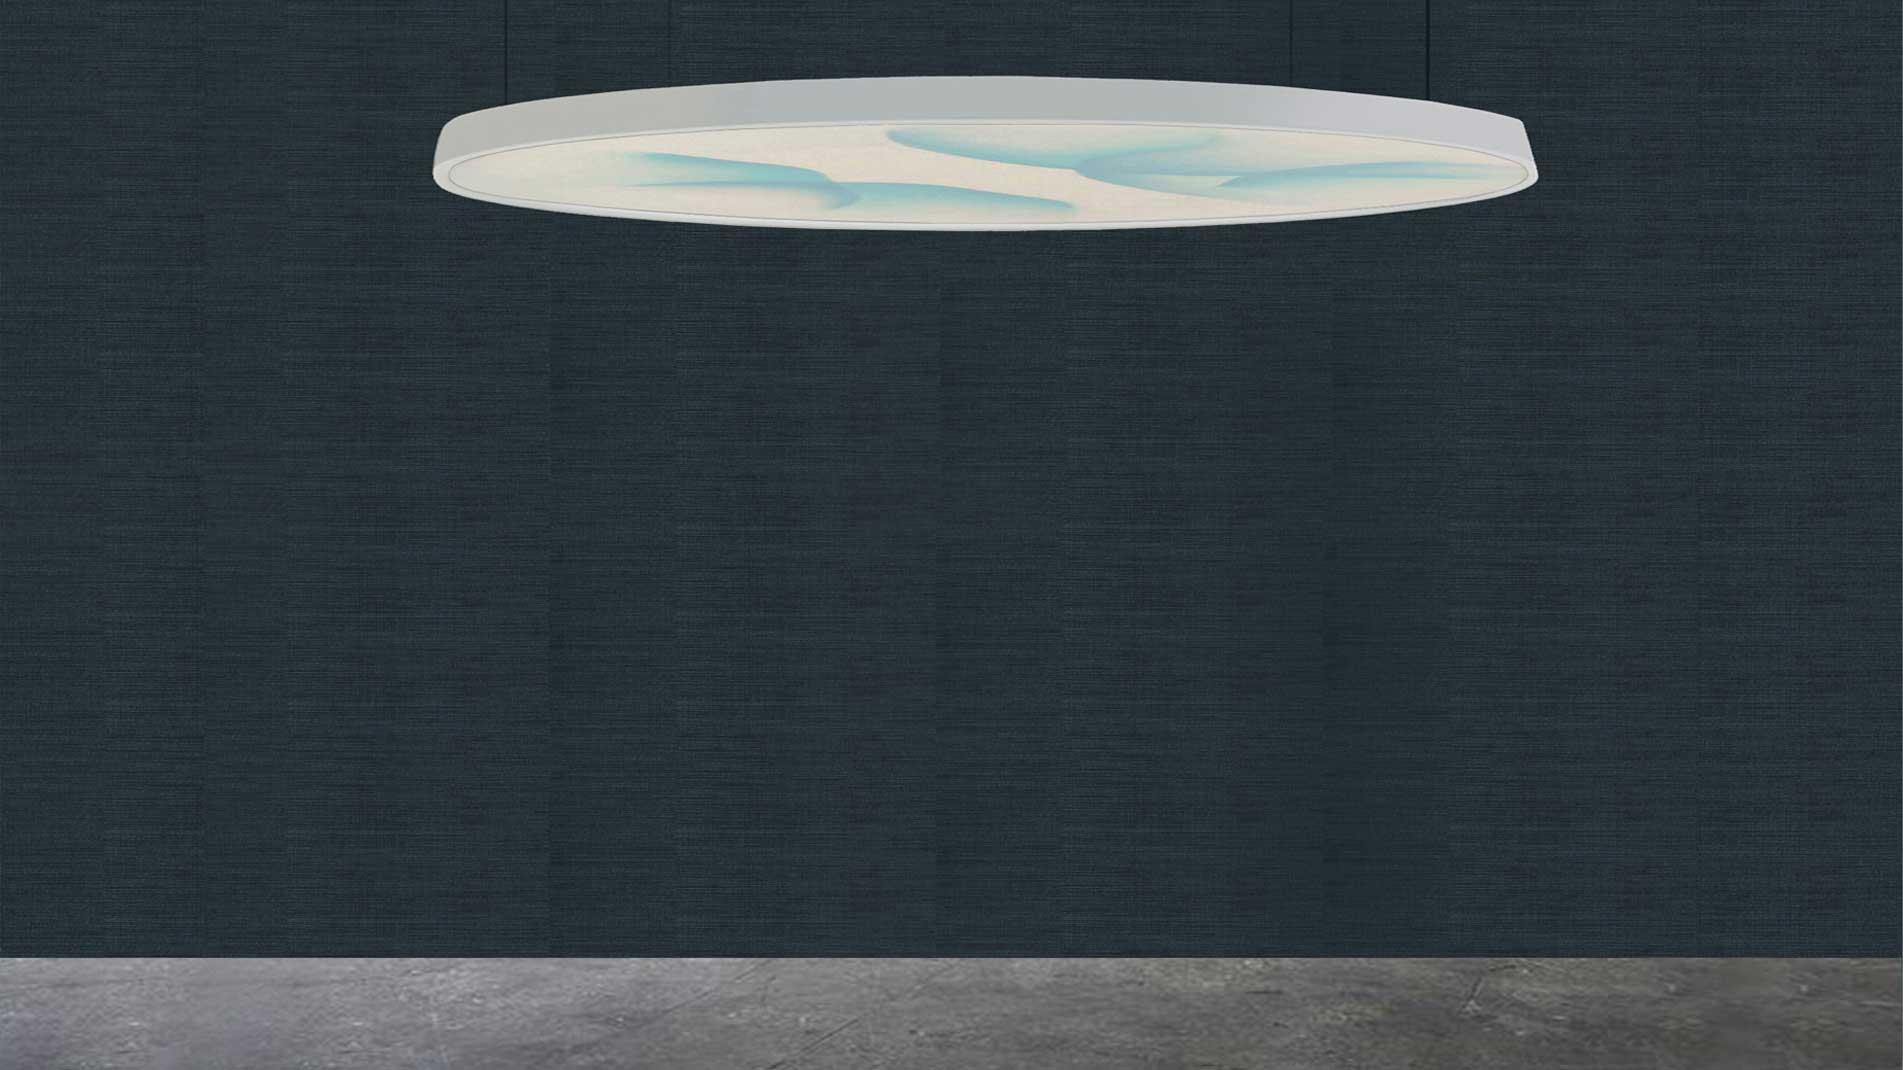 Guillaume Bottazzi, backlit artwork, public art in Lyon